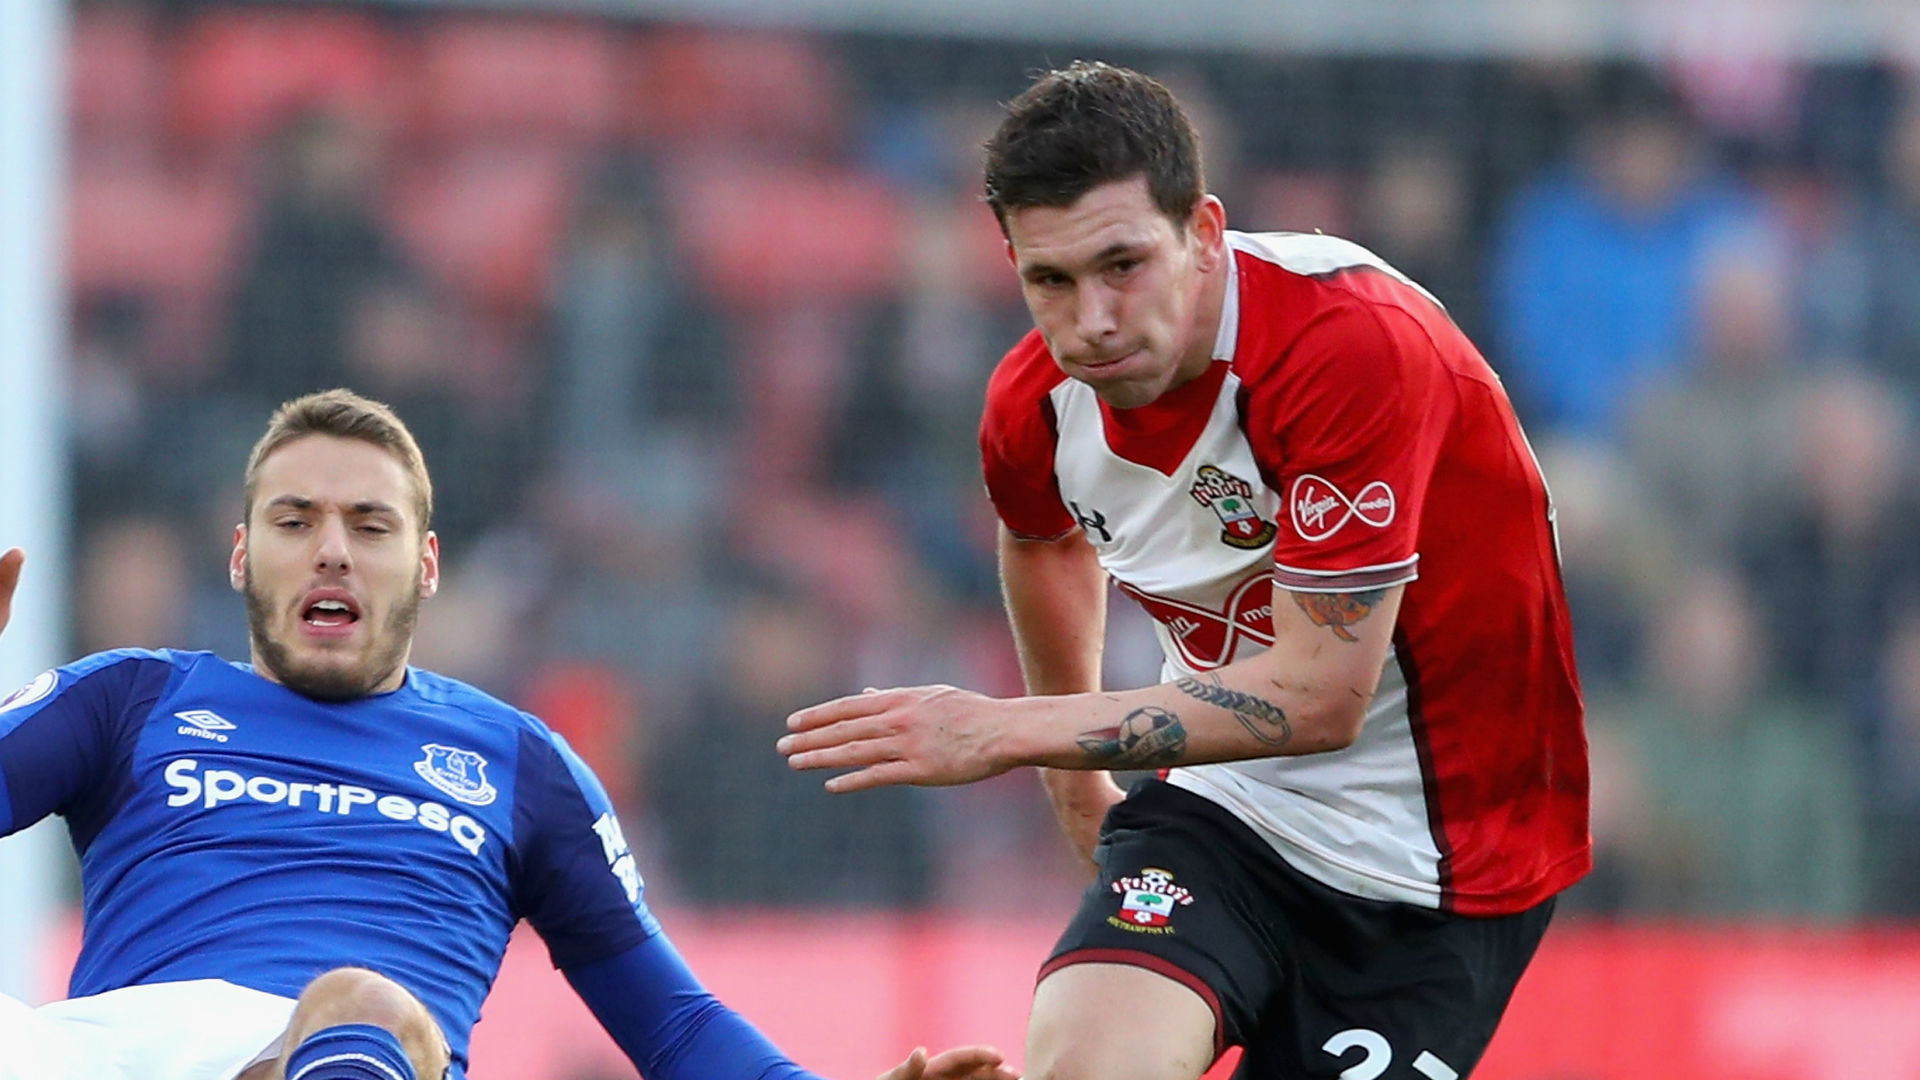 Pierre-Emile Hojbjerg Southampton Everton